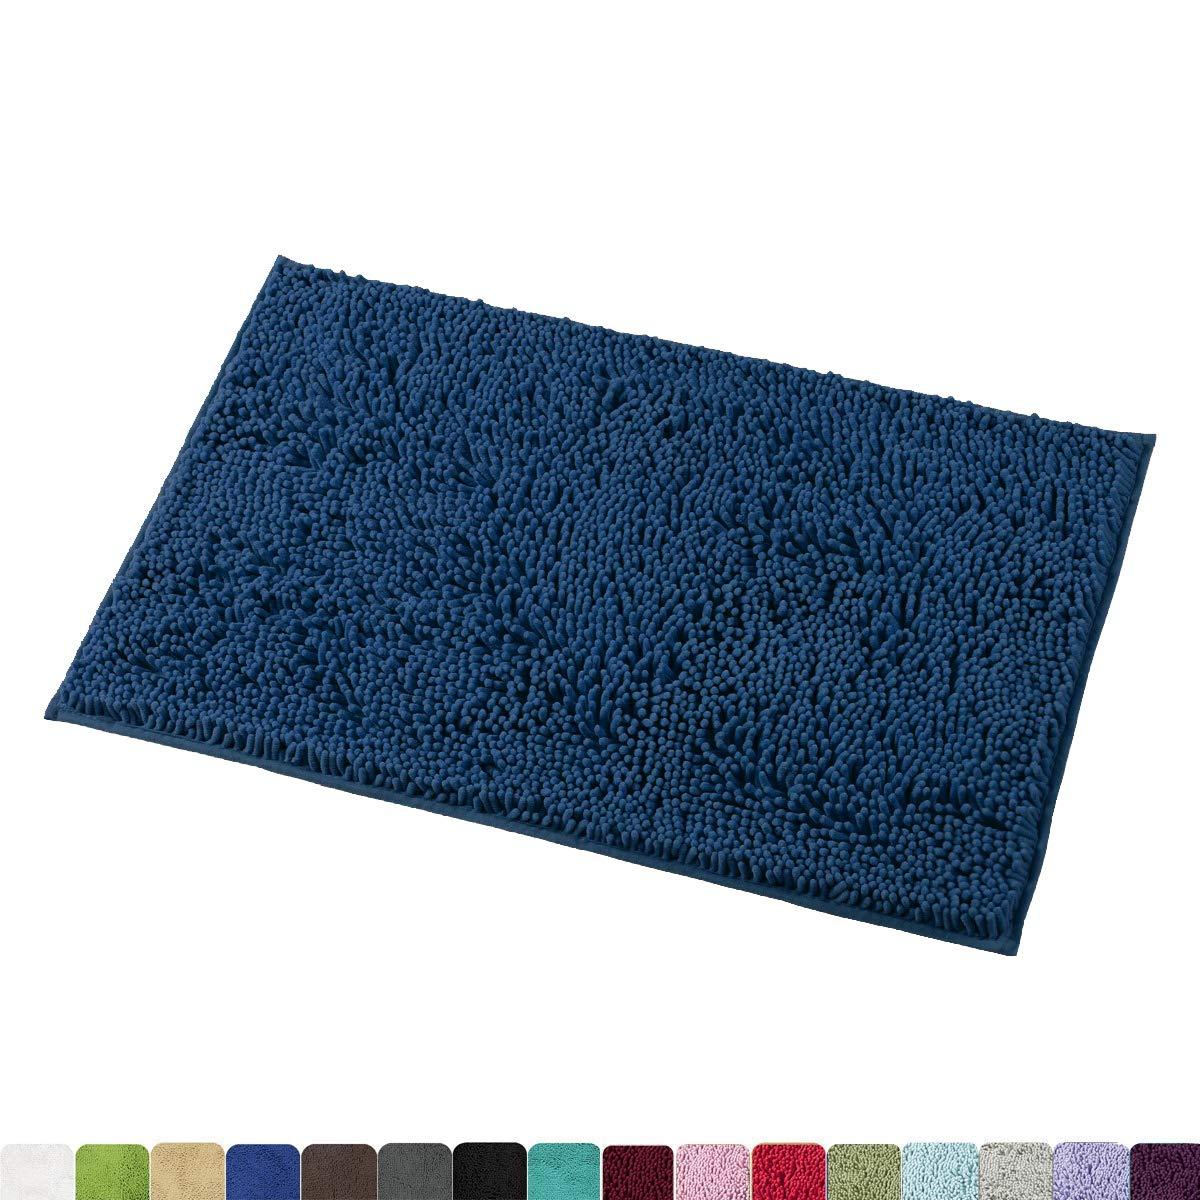 MAYSHINE 20x32 Inches Non-Slip Bathroom Rug Shag Shower Mat Machine-Washable Bath Mats with Water Absorbent Soft Microfibers of - Dark Blue